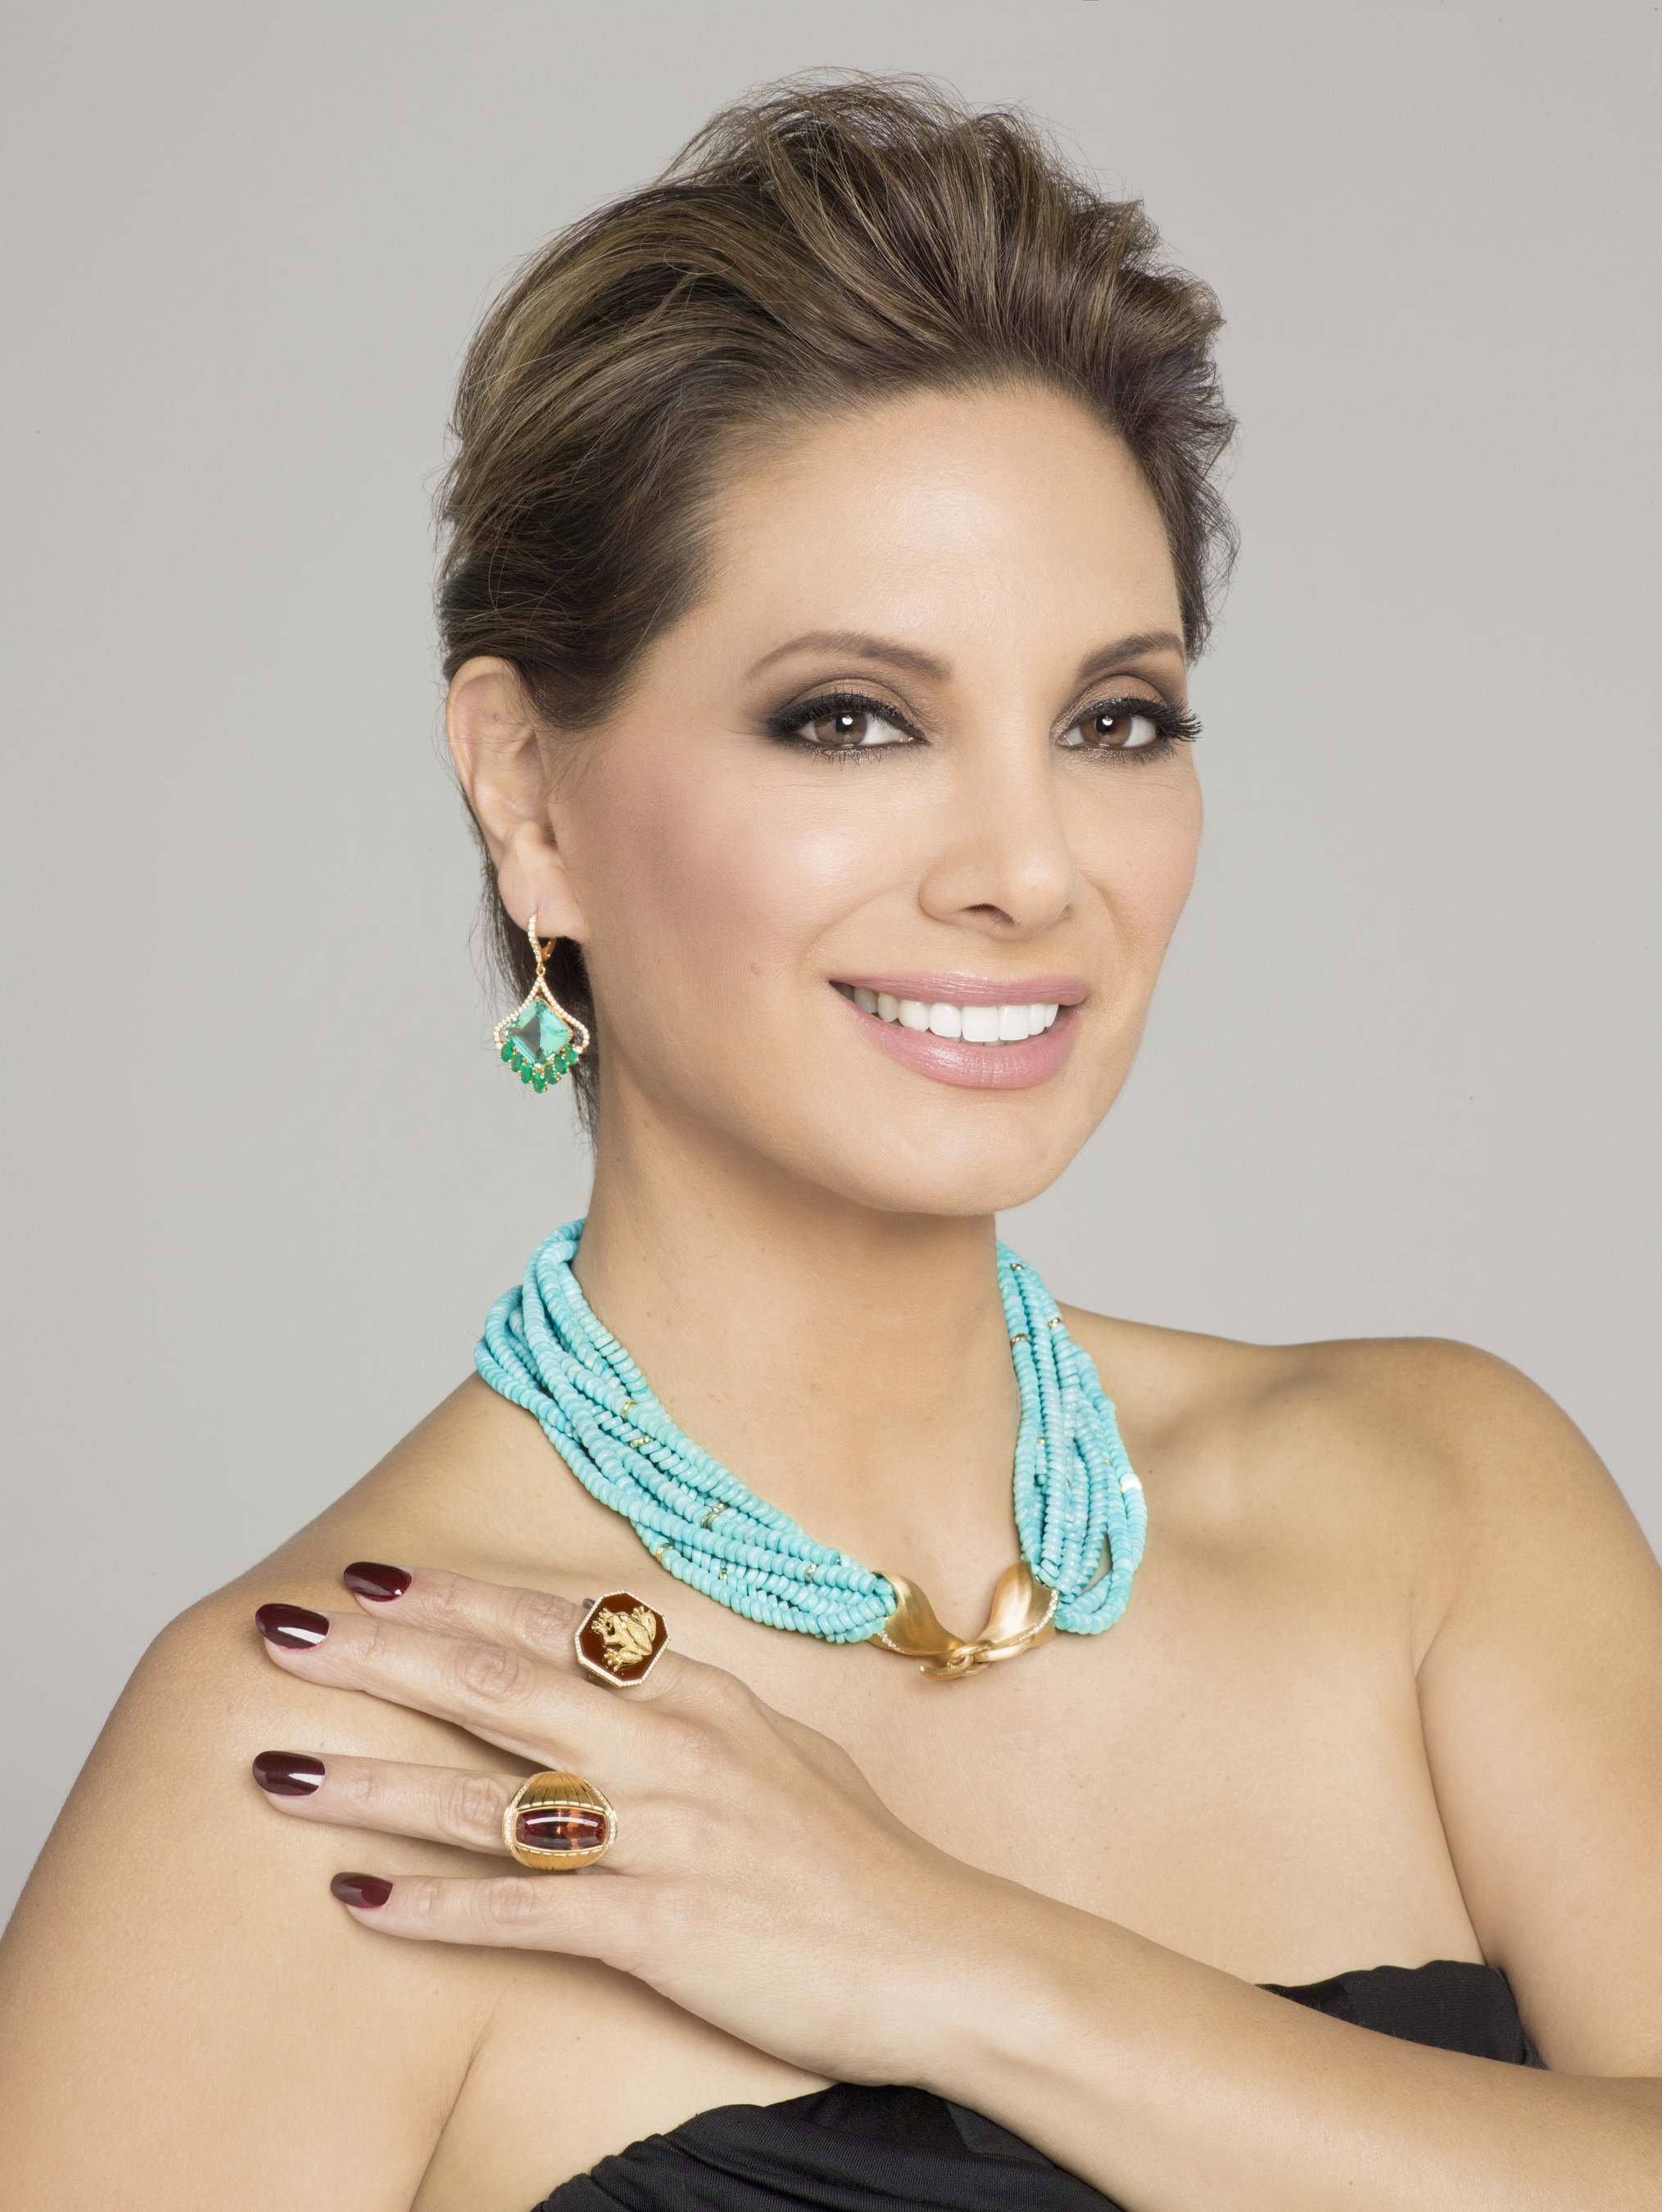 2016 AGTA Spectrum Awards(TM) jewelry worn by Alex Meneses. Earrings by Bella Campbell, necklace by Naomi Sarna, rings by Kim Hurlbert-Sarosi and Ricardo Basta.